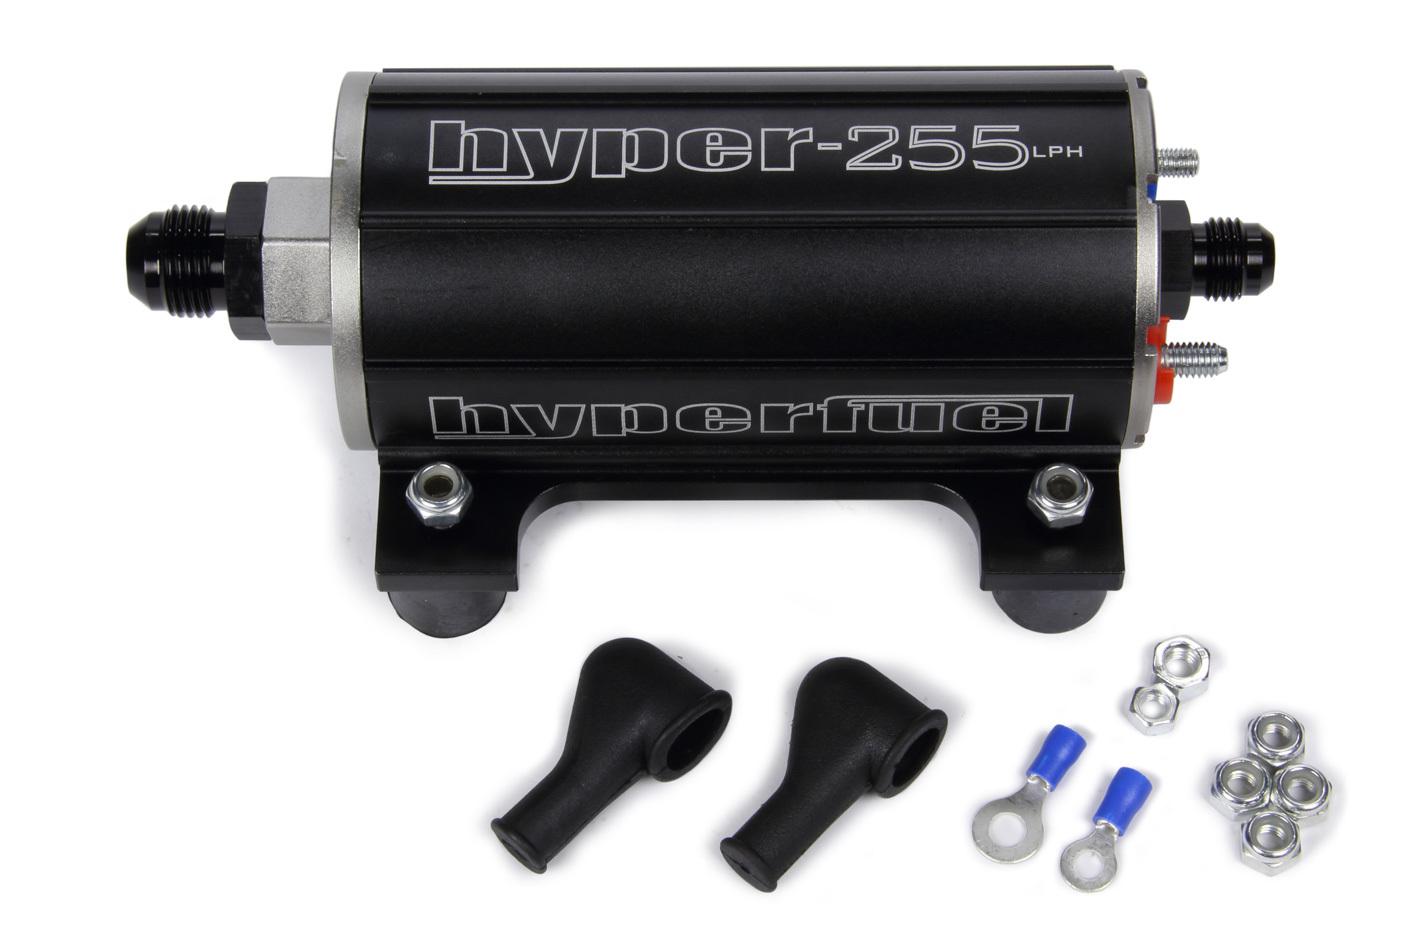 FST Performance Carburetor 40105 Fuel Pump, Electric, In-Line, 255 lph, 6 AN Inlet, 6 AN Outlet, Aluminum, Black Anodize, E85 / Gas, Each